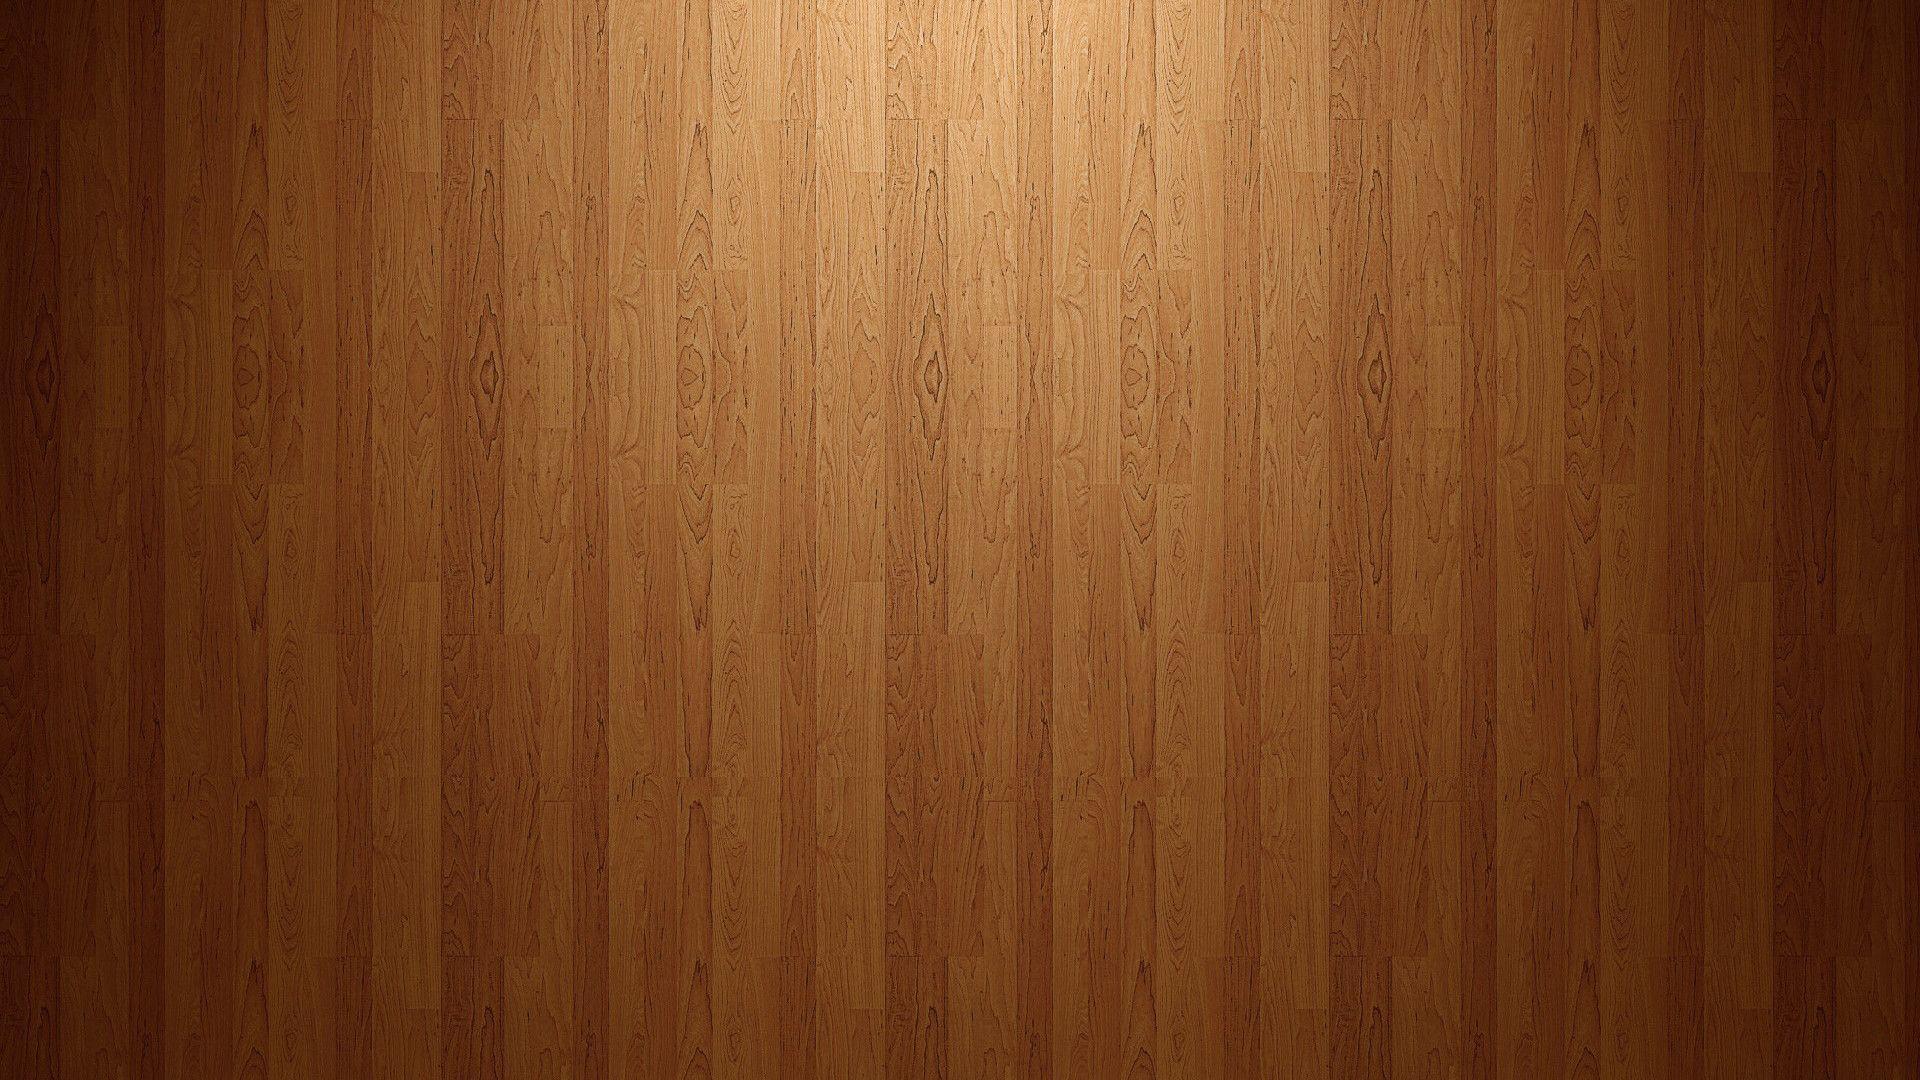 Wood Texture Wood Texture 1920x1080 HD 1080p HD Wallpaper .